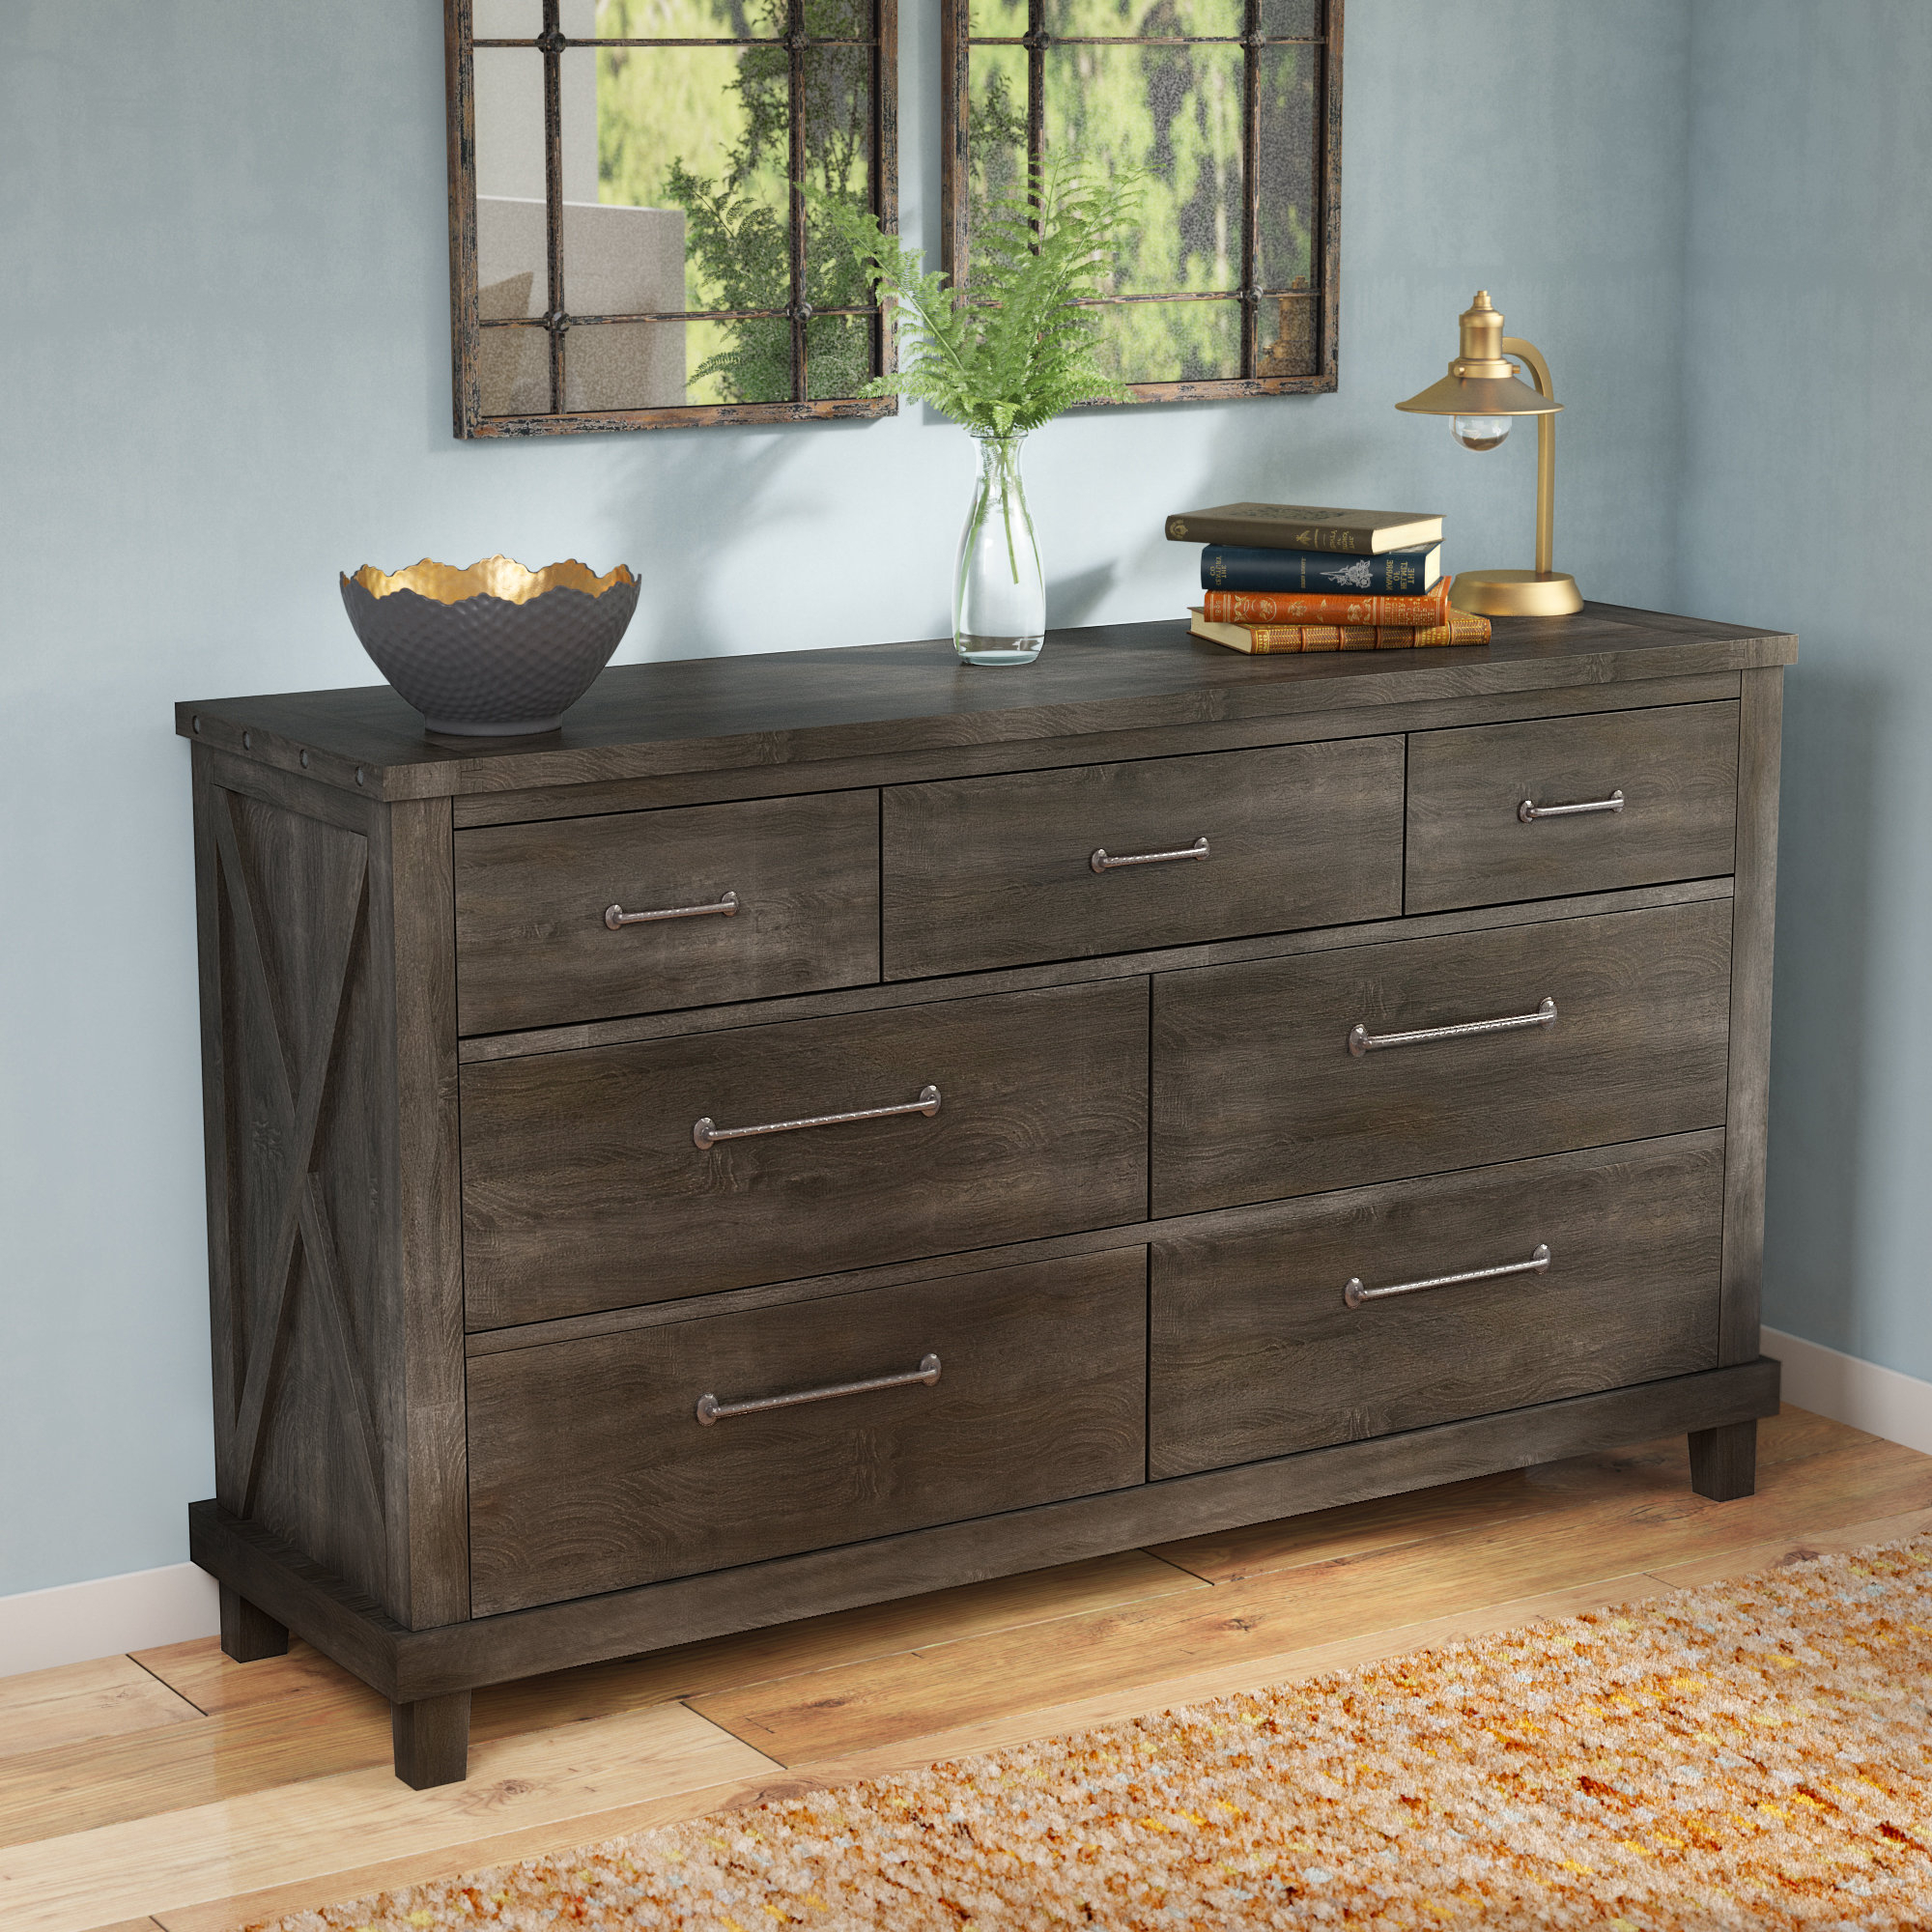 Langsa 7 Drawer Double Dresser With Regard To Langsa Sideboards (View 15 of 20)